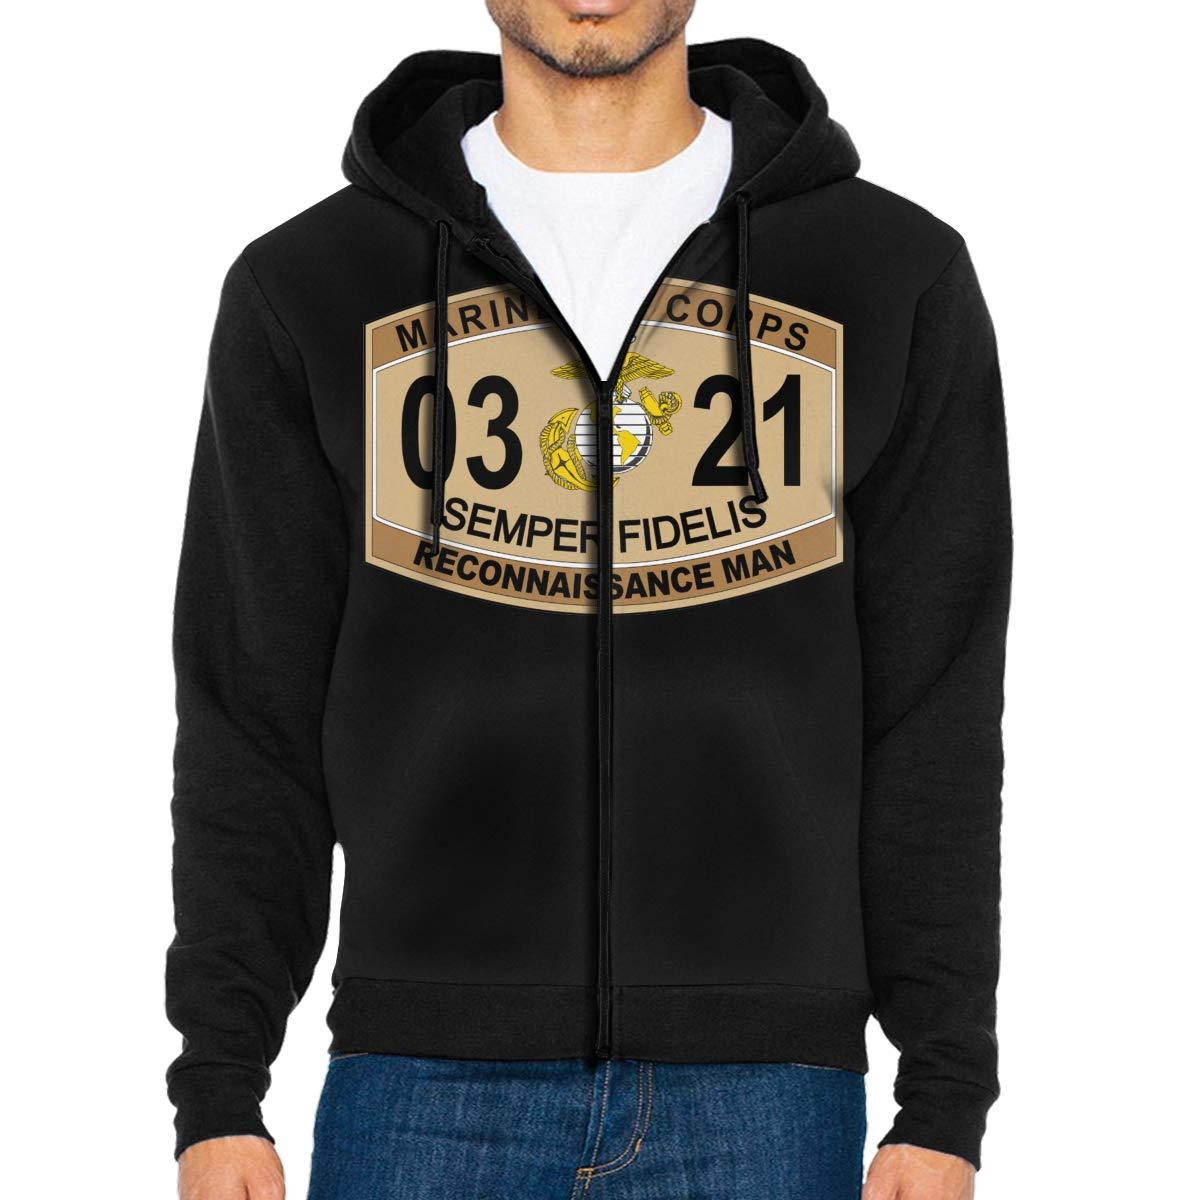 Reconnaissance Man Marine Corps MOS 0321 U.S.M Mens Full-Zip Up Hoodie Jacket Pullover Sweatshirt